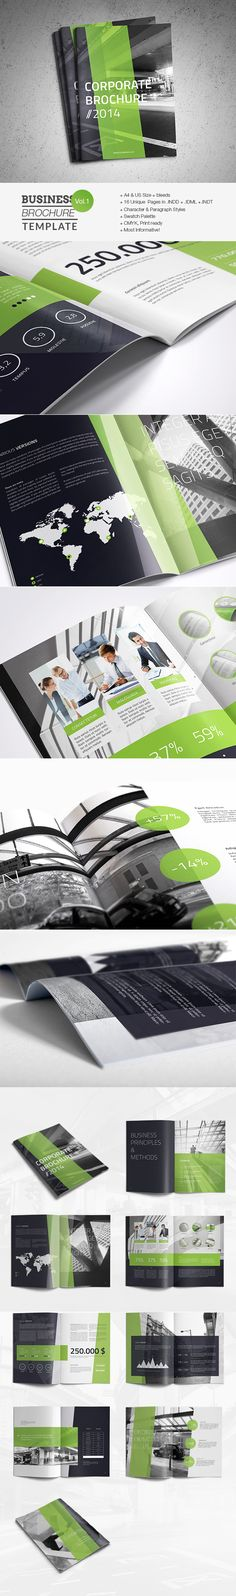 Business Brochure Template by Realstar, via Behance #graphicdesign #print #brochure